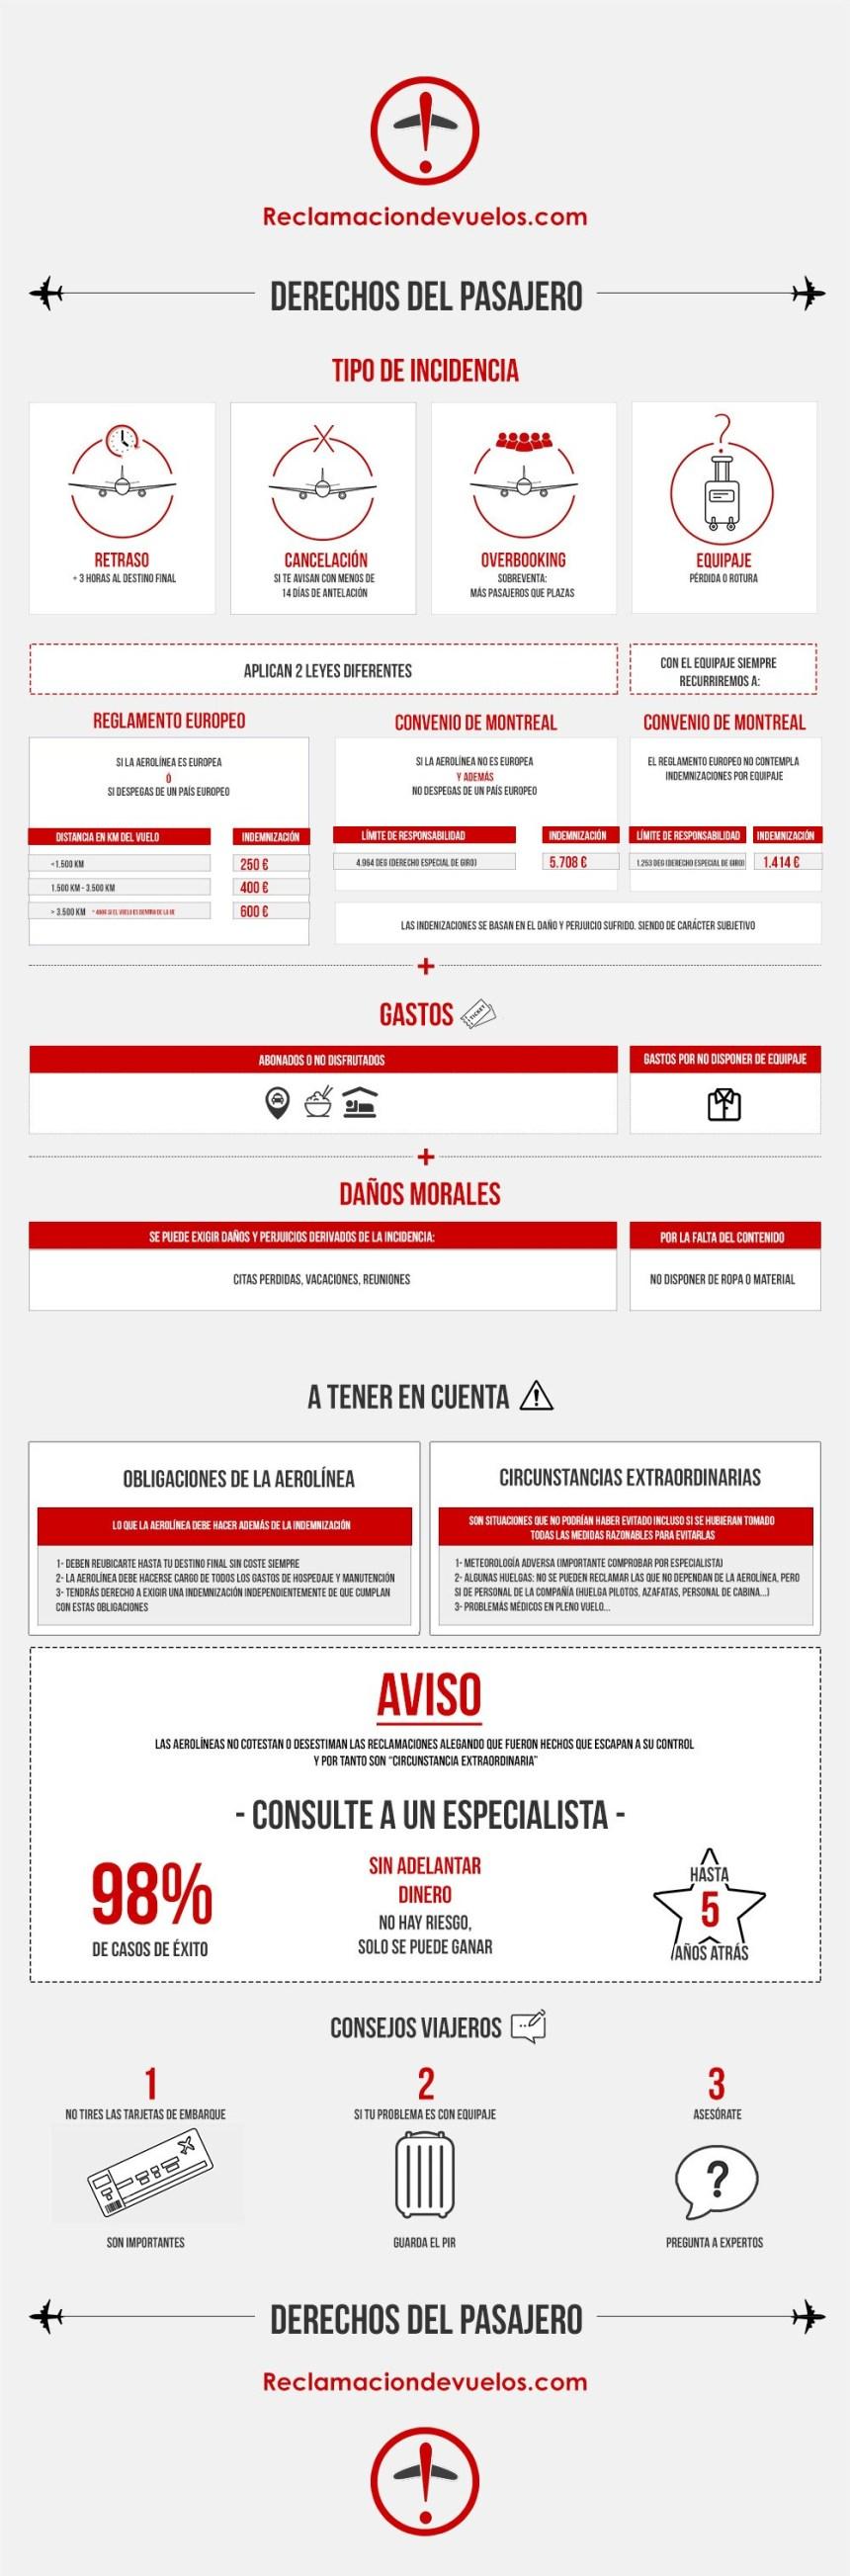 Derechos del pasajero de un vuelo #infografia #infographic #turismo